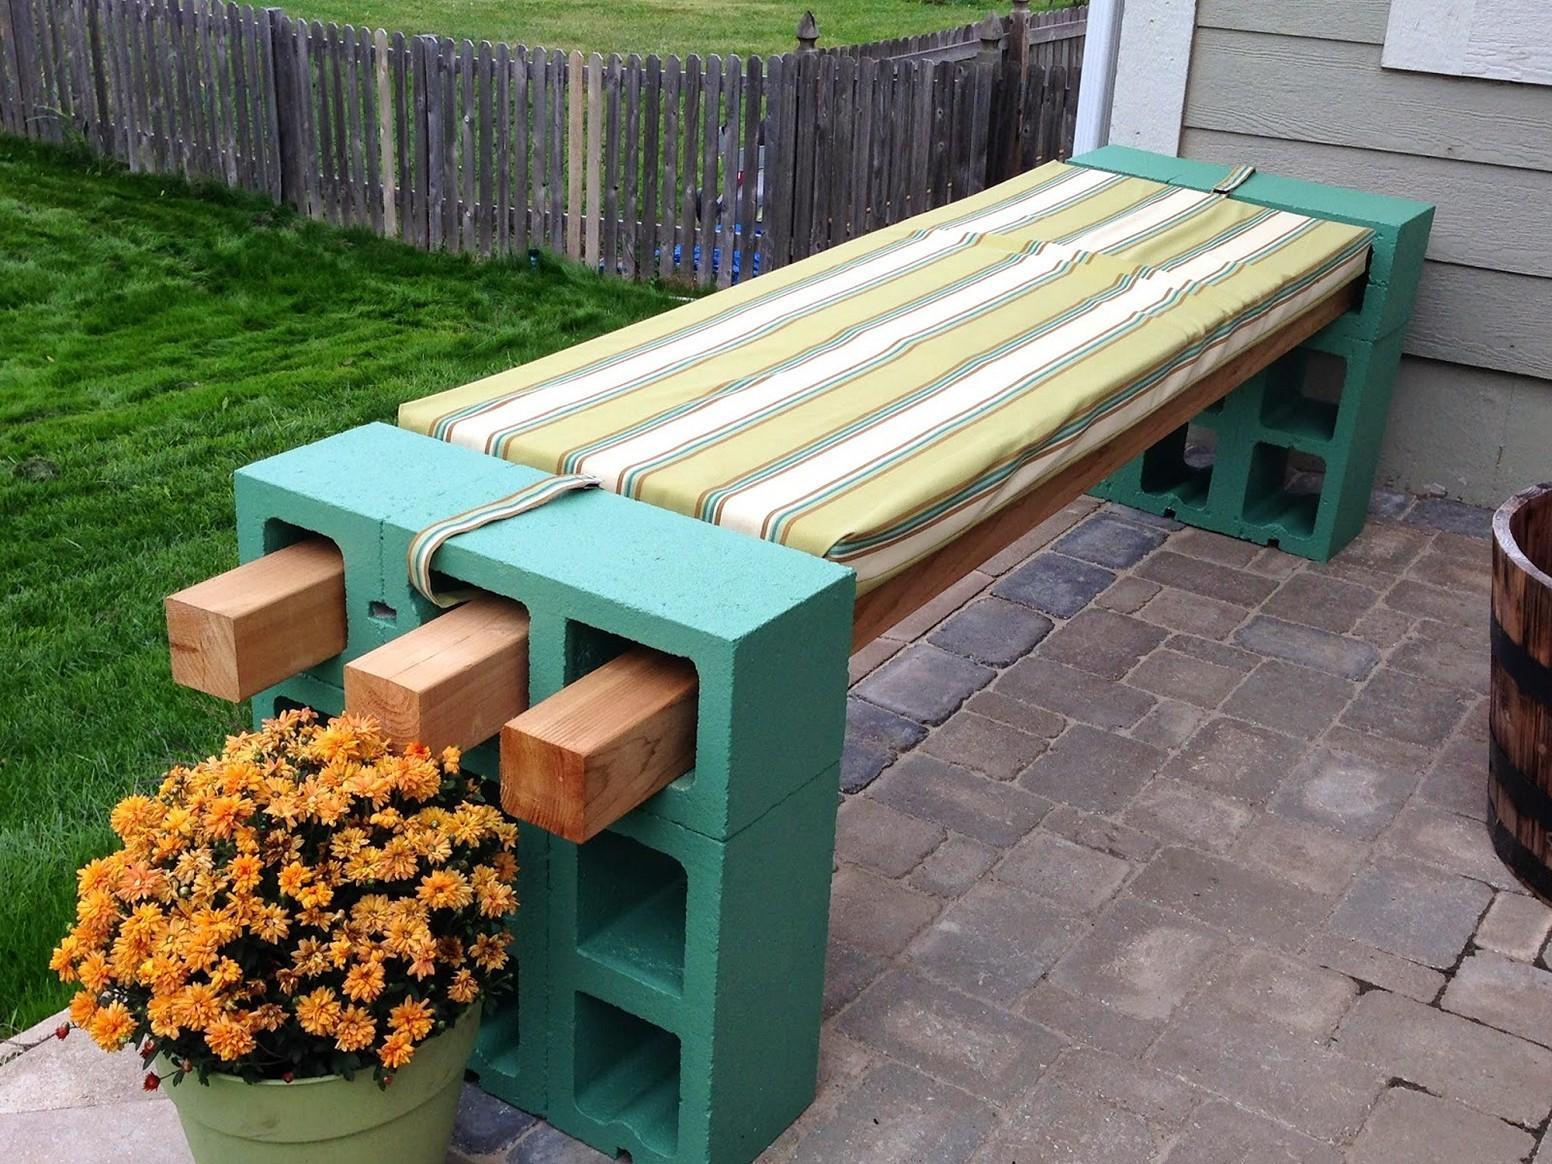 28 image of cinder block bench on porch